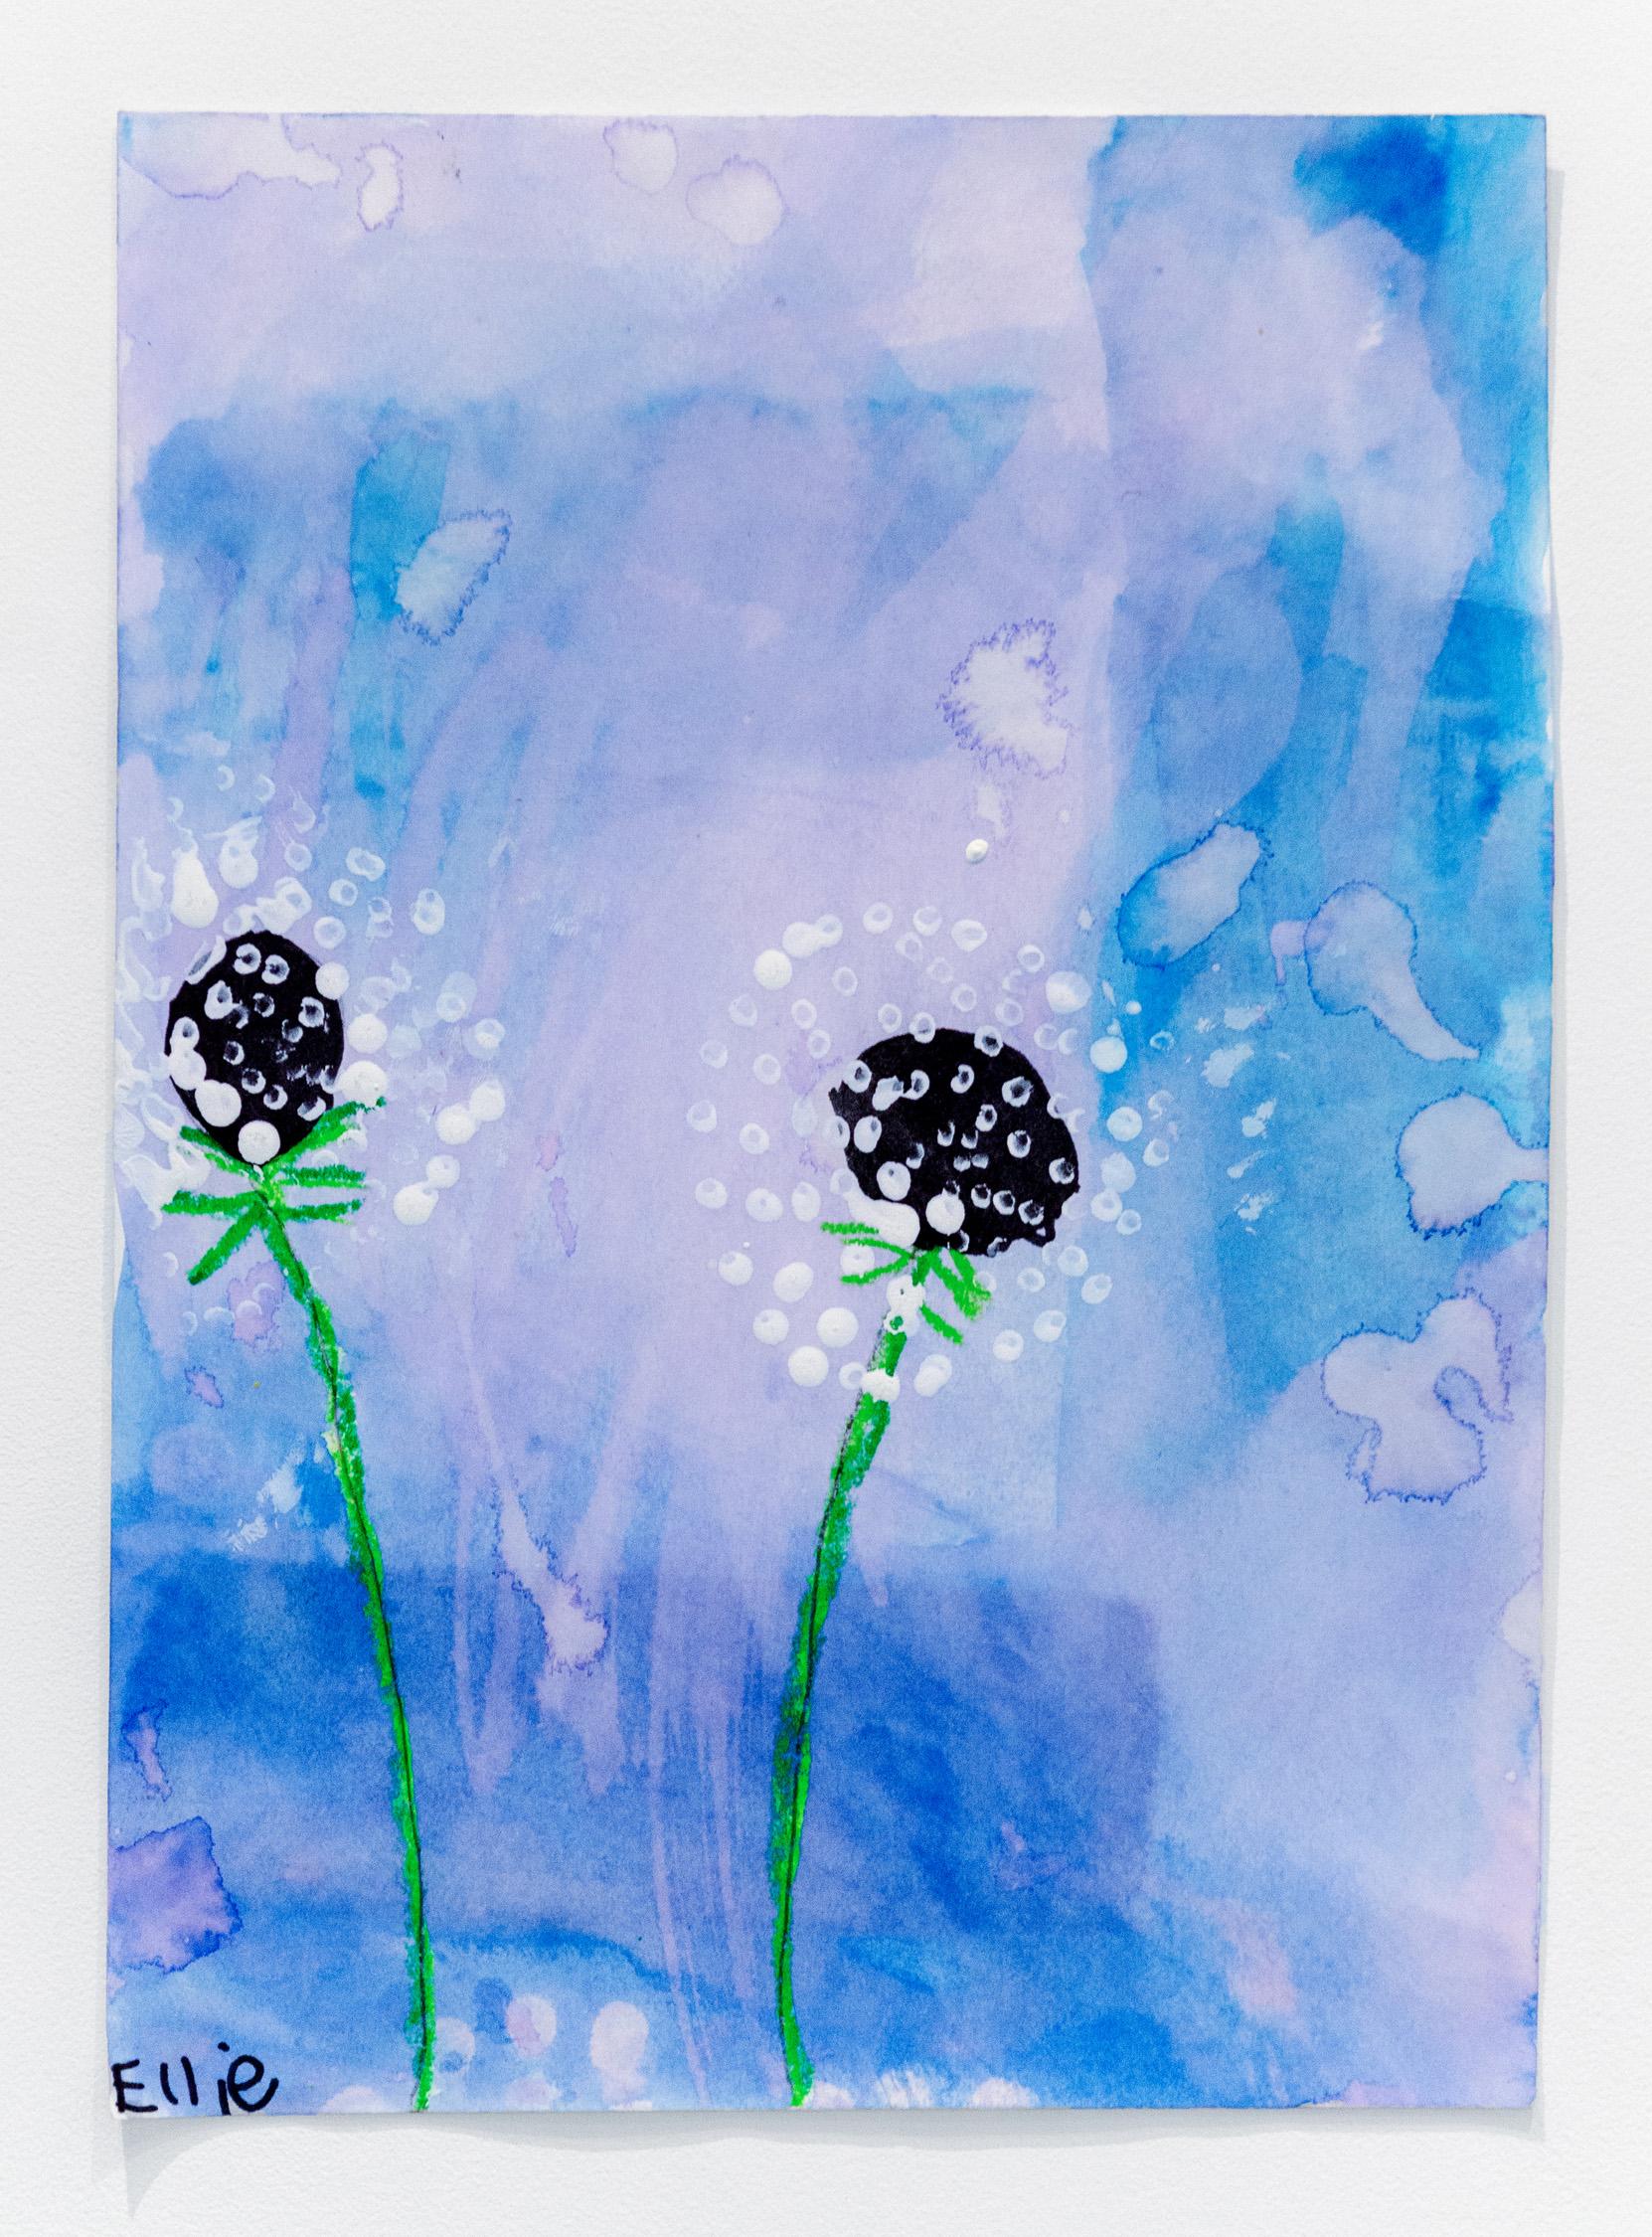 Ellie Rosenblatt,    Dandelion Bloom , 2019, Watercolor, pastel and pencil on paper, 11.25 x 8.25 inches (28.5 x 21.5 cm)